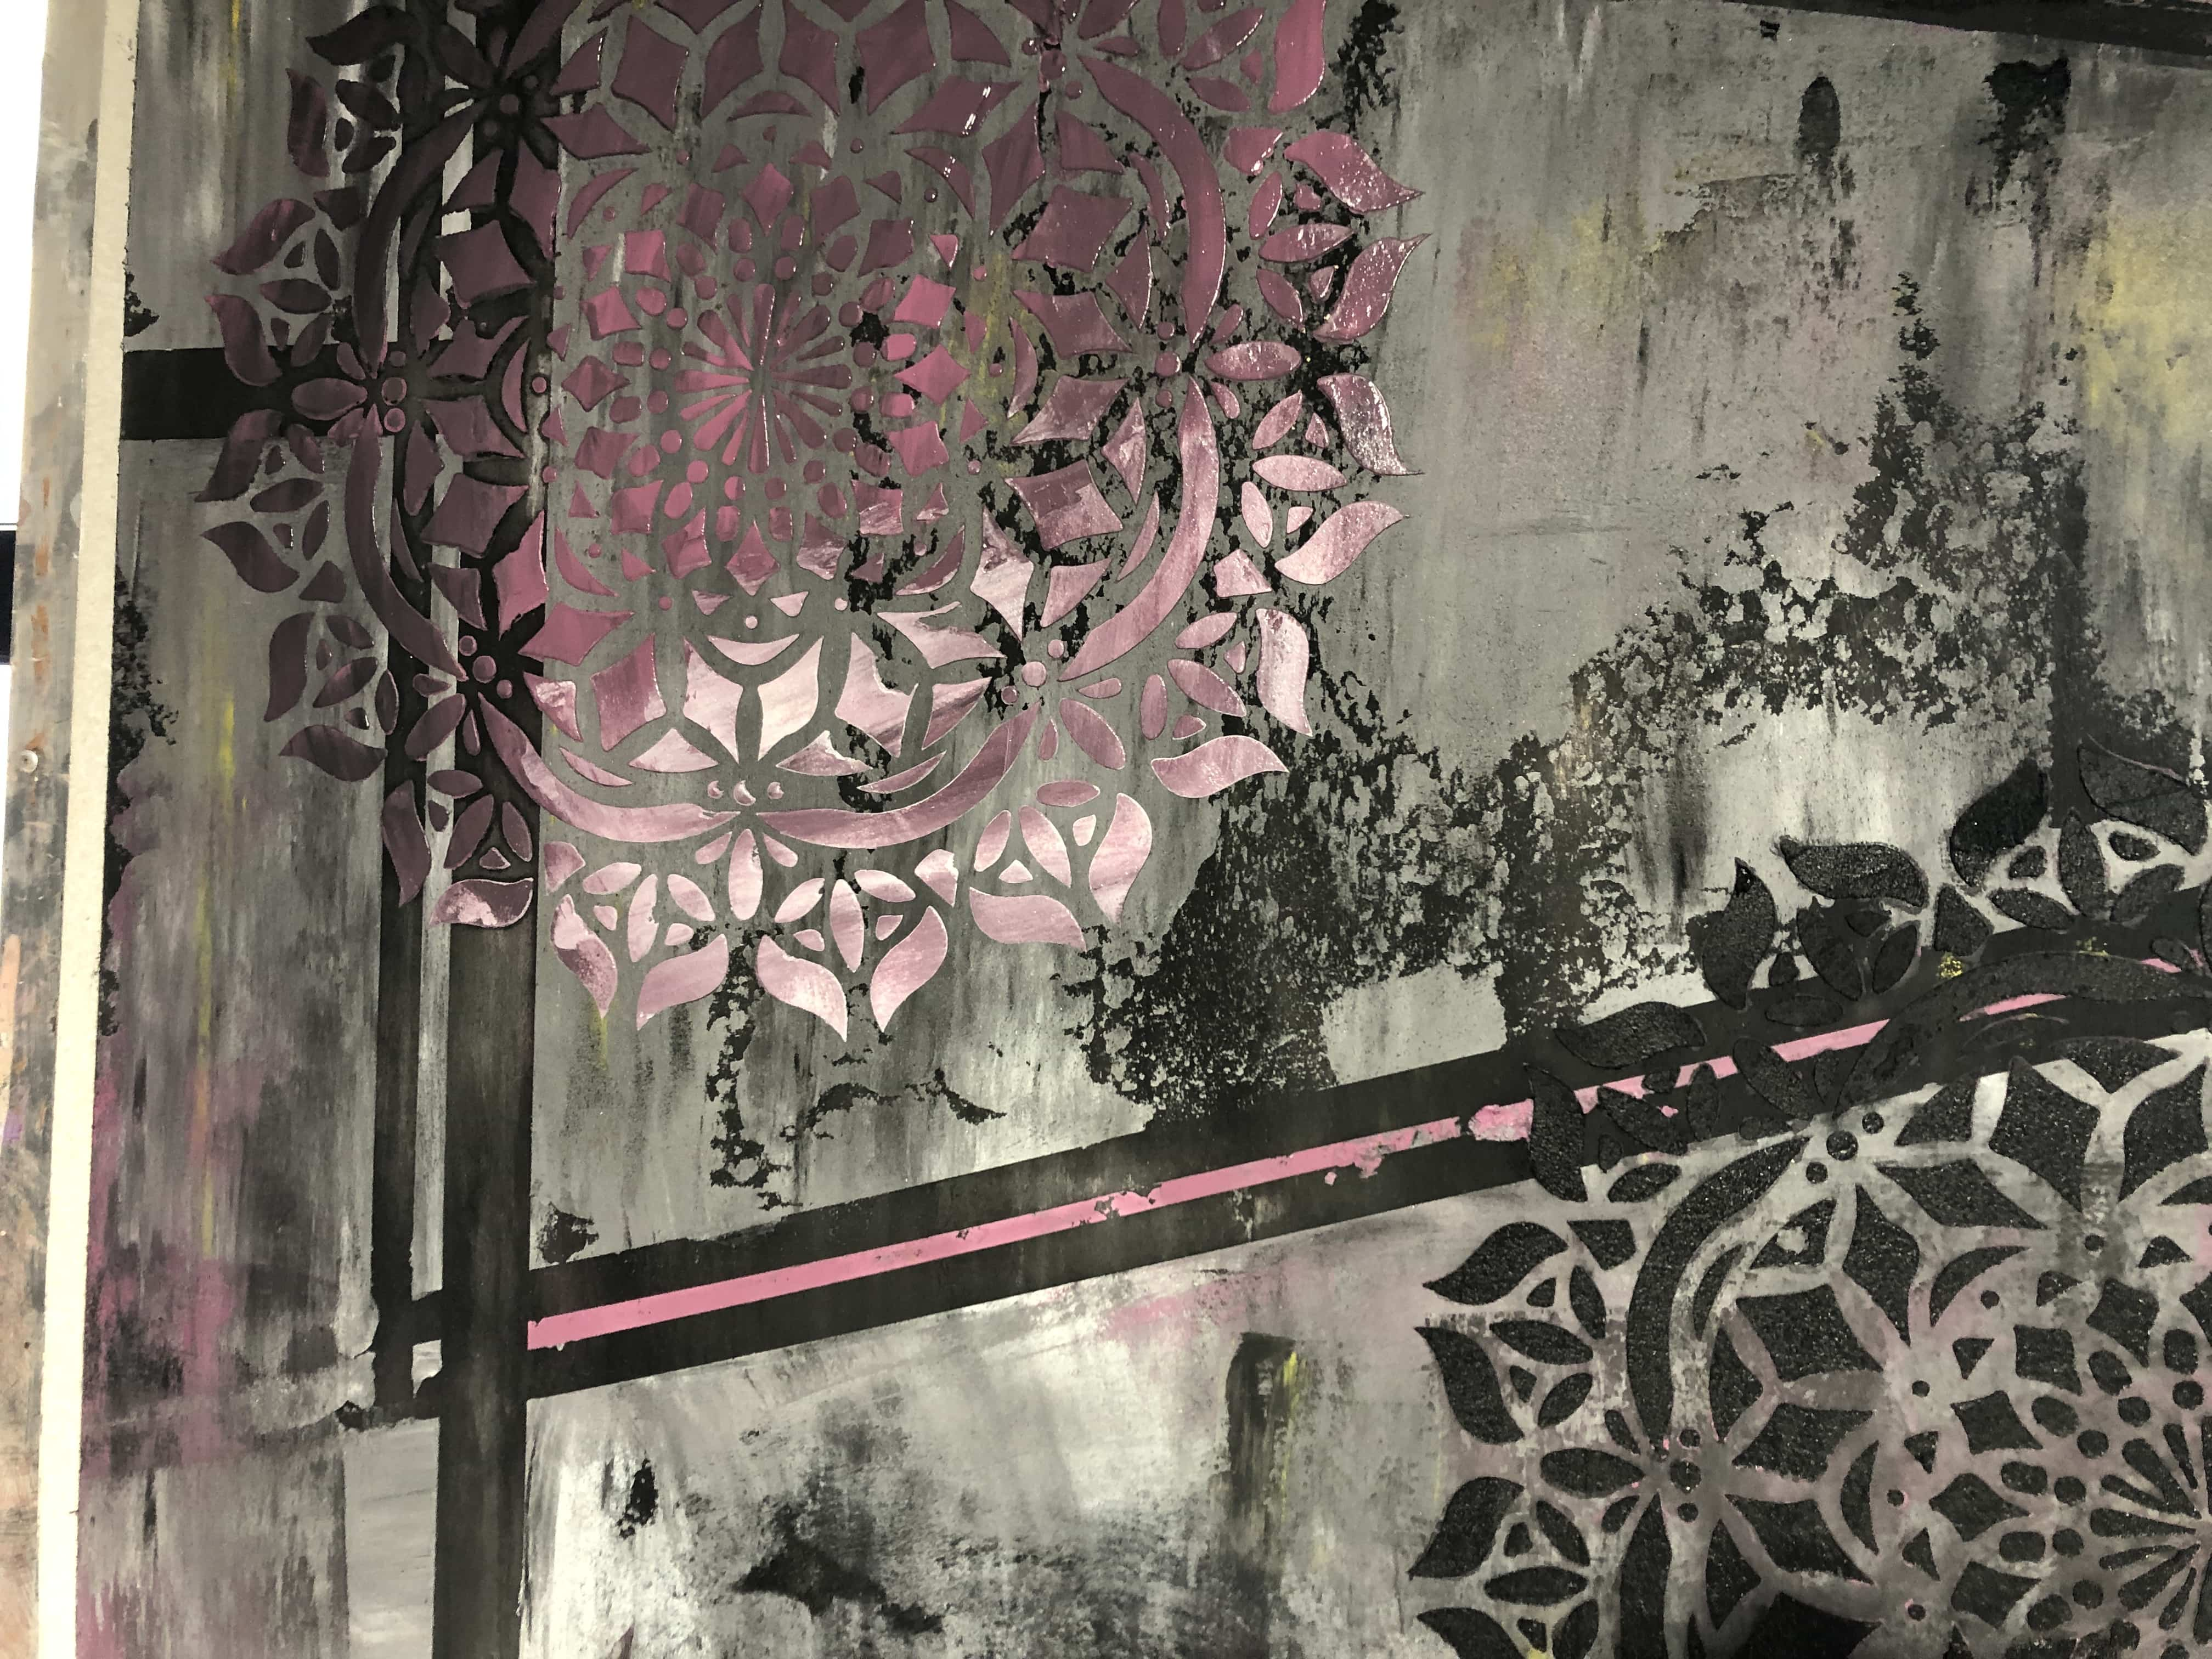 Pittura Granulosa Per Cartongesso pitture decorative per interni: clessiche, moderne e vasta